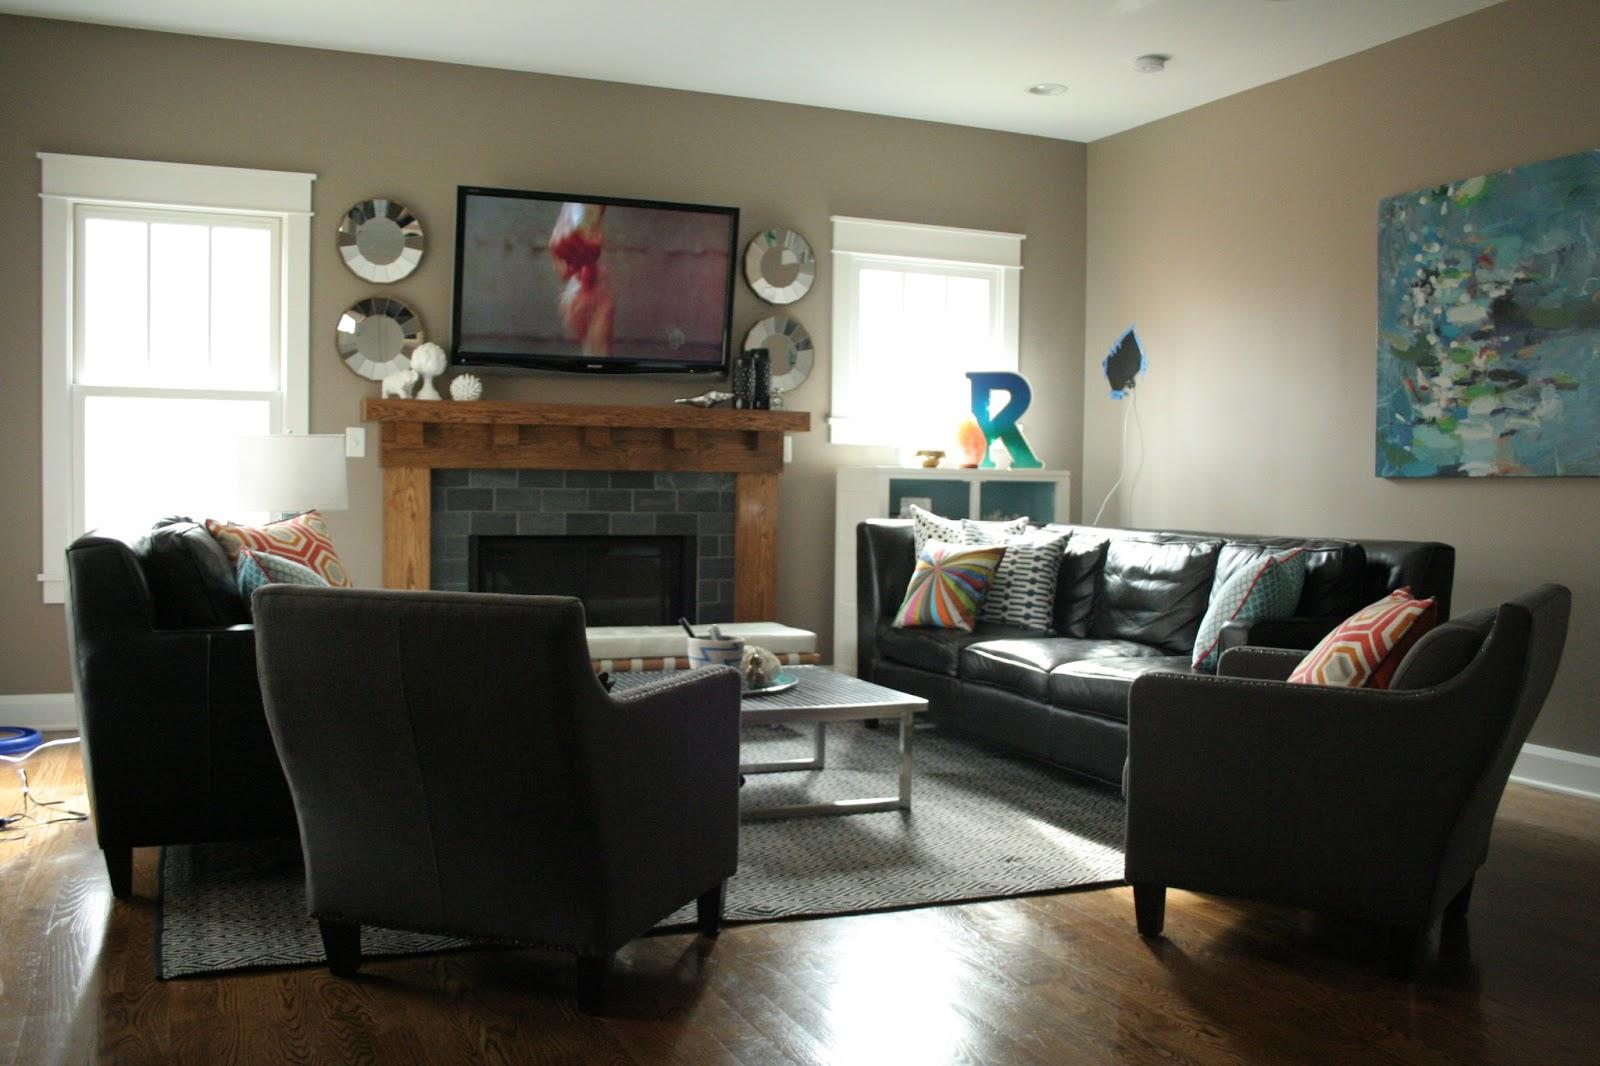 how to arrange living room with tv above fireplace open plan kitchen design ideas furniture arrangement | homesfeed